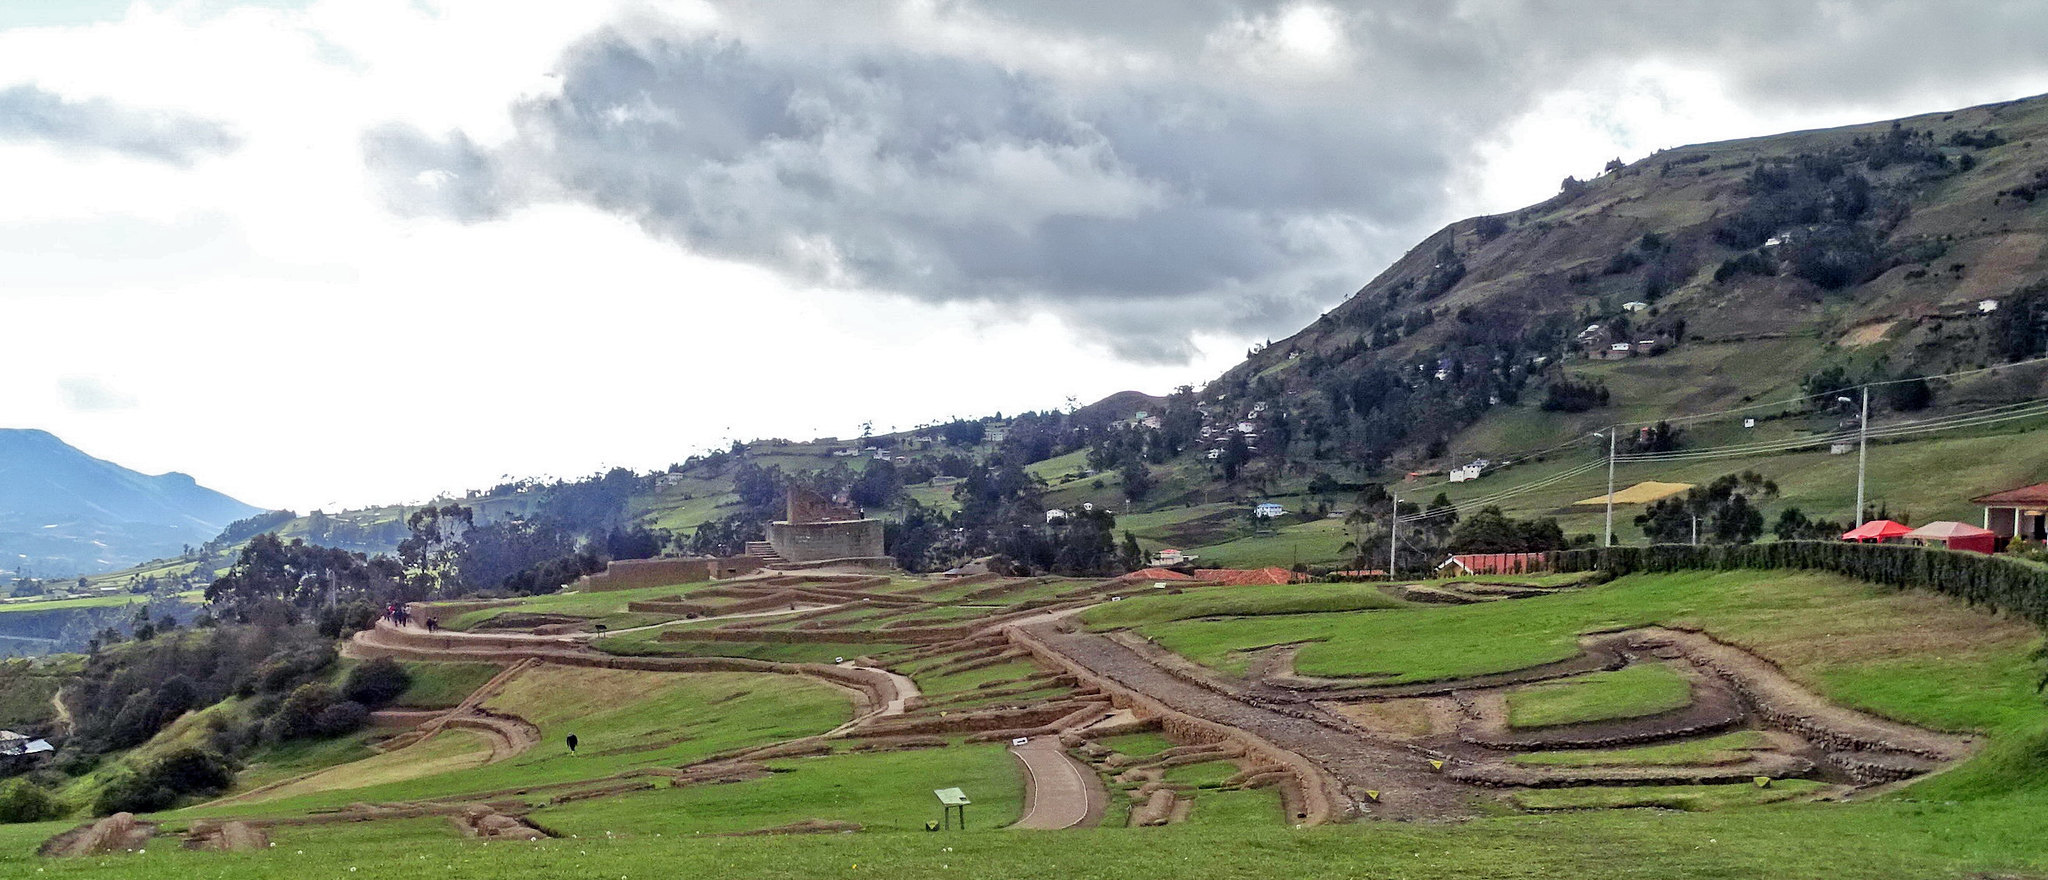 Vistas generales Ingapirca Ecuador